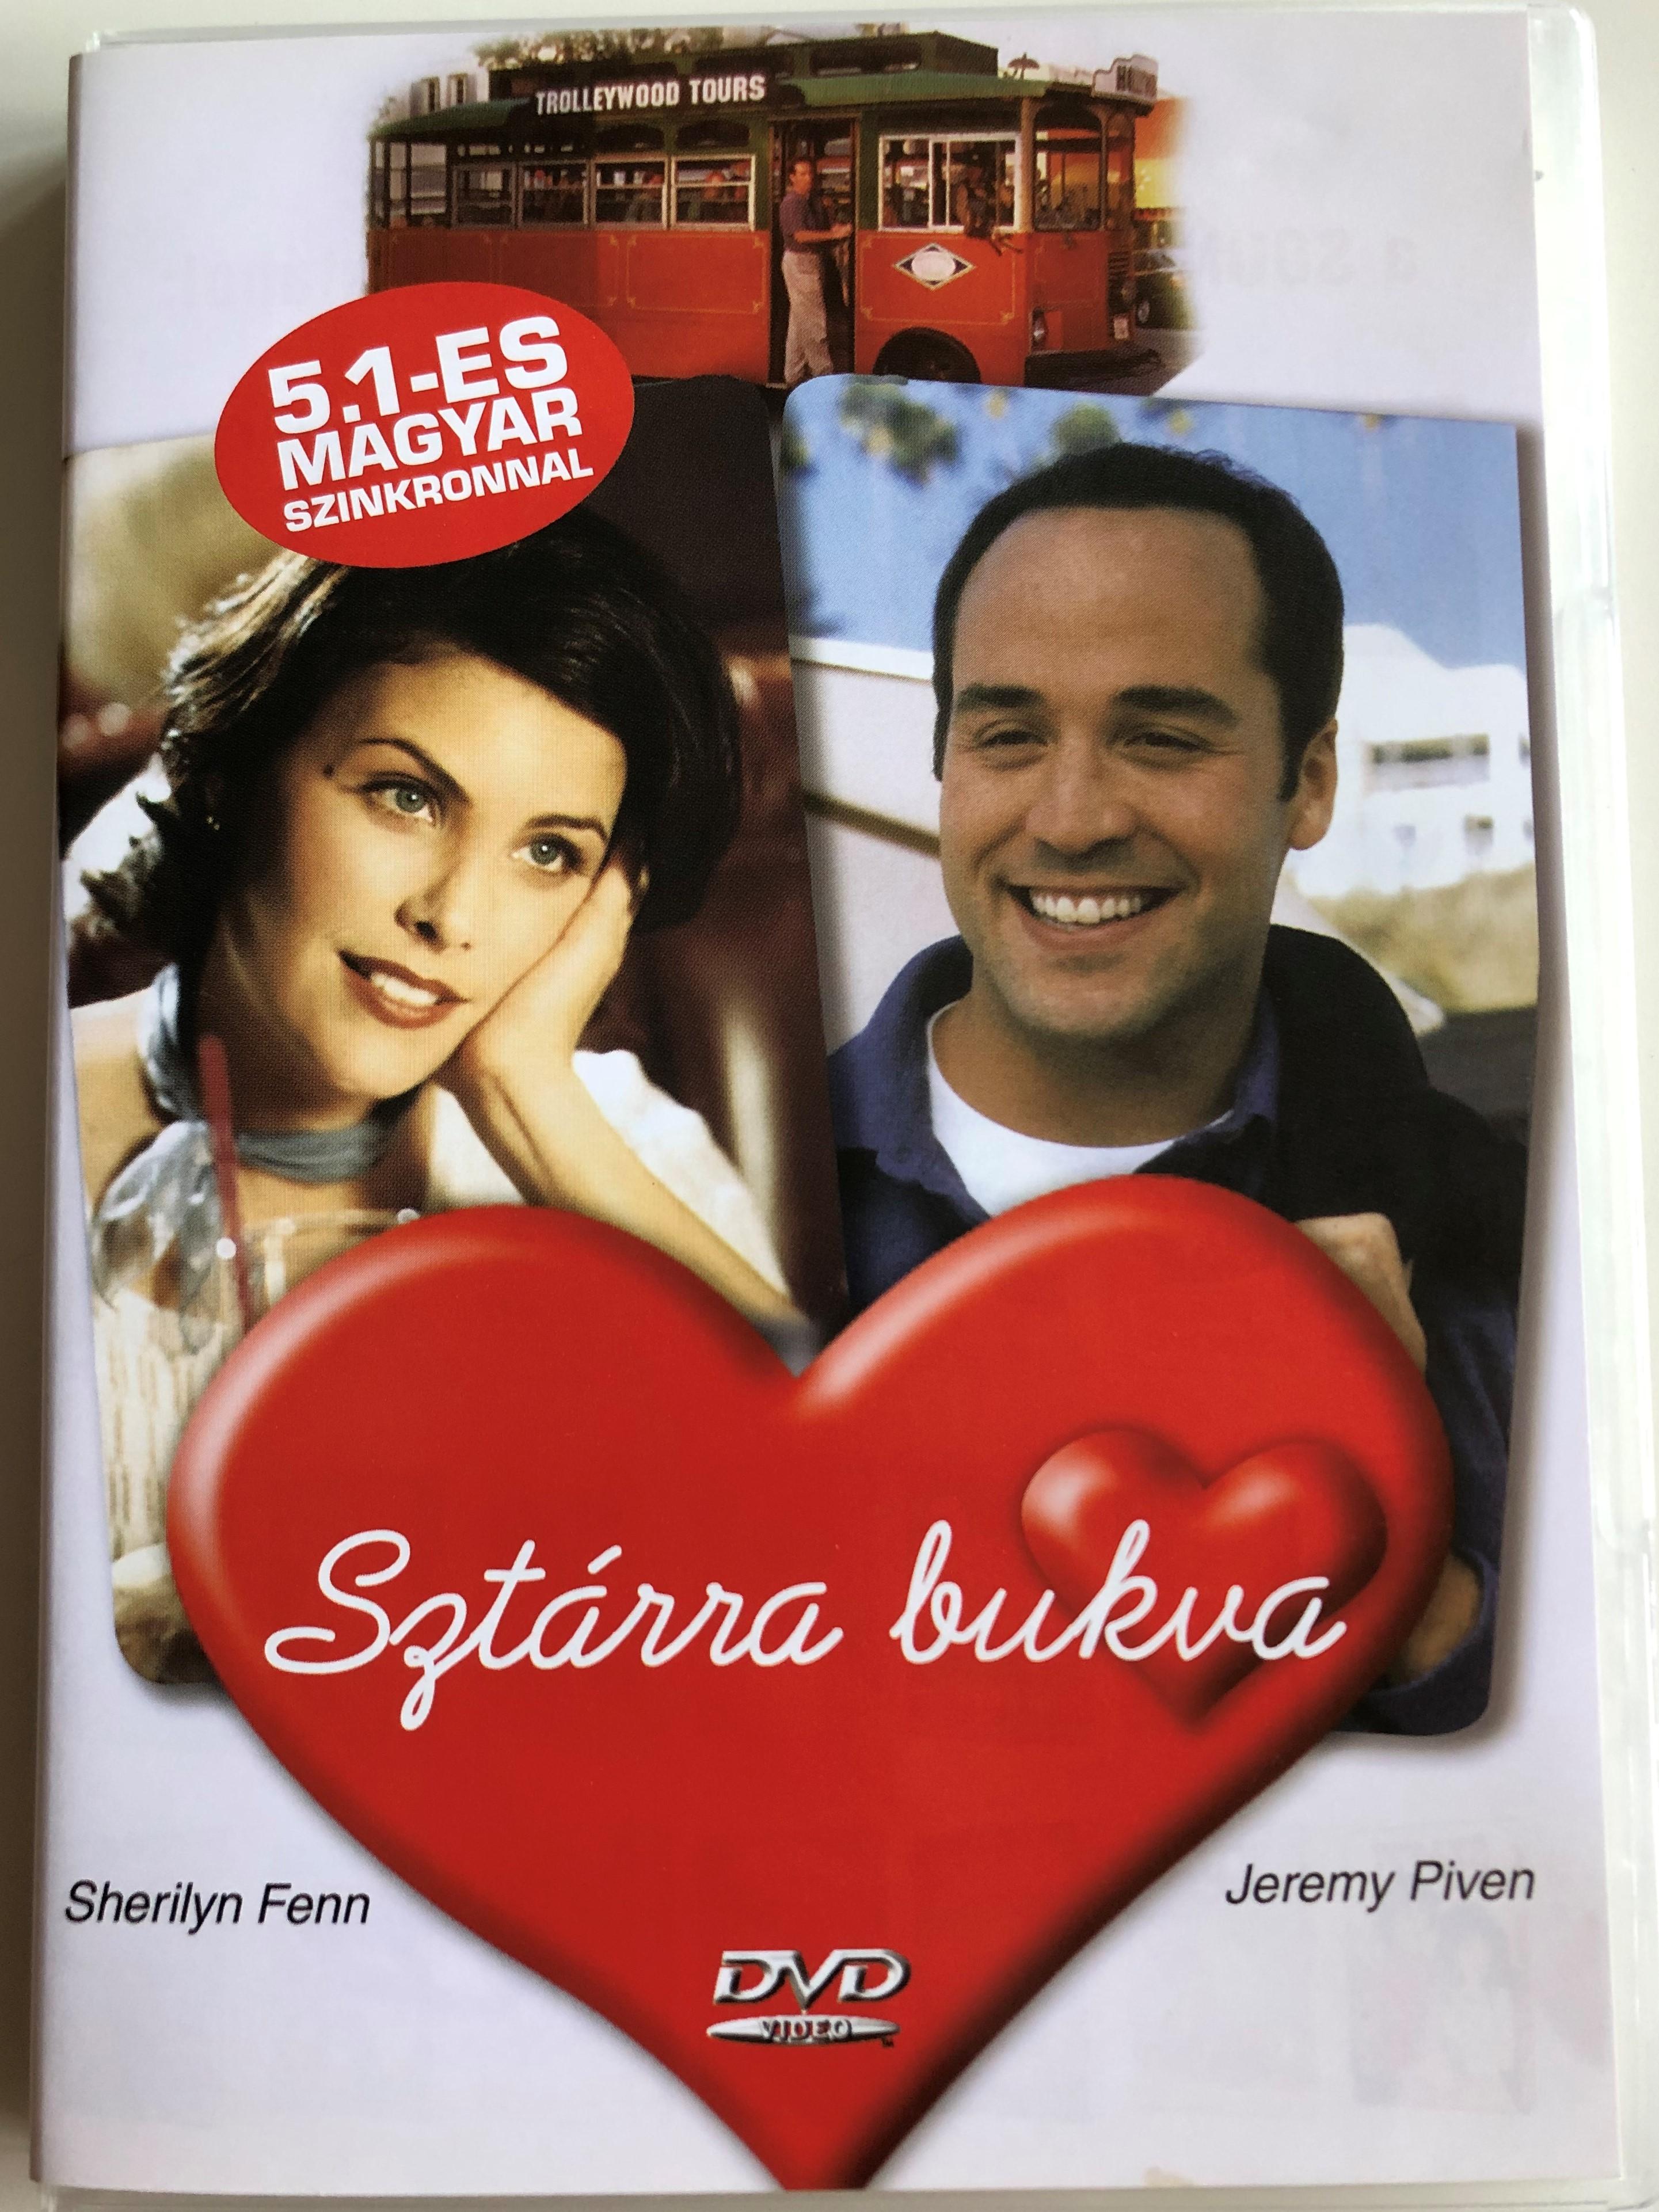 just-write-dvd-1997-szt-rra-bukva-directed-by-andrew-gallerani-starring-sherilyn-fenn-jeremy-piven-jobeth-williams-wallace-shawn-alex-rocco-yeardley-smith-holland-taylor-1-.jpg